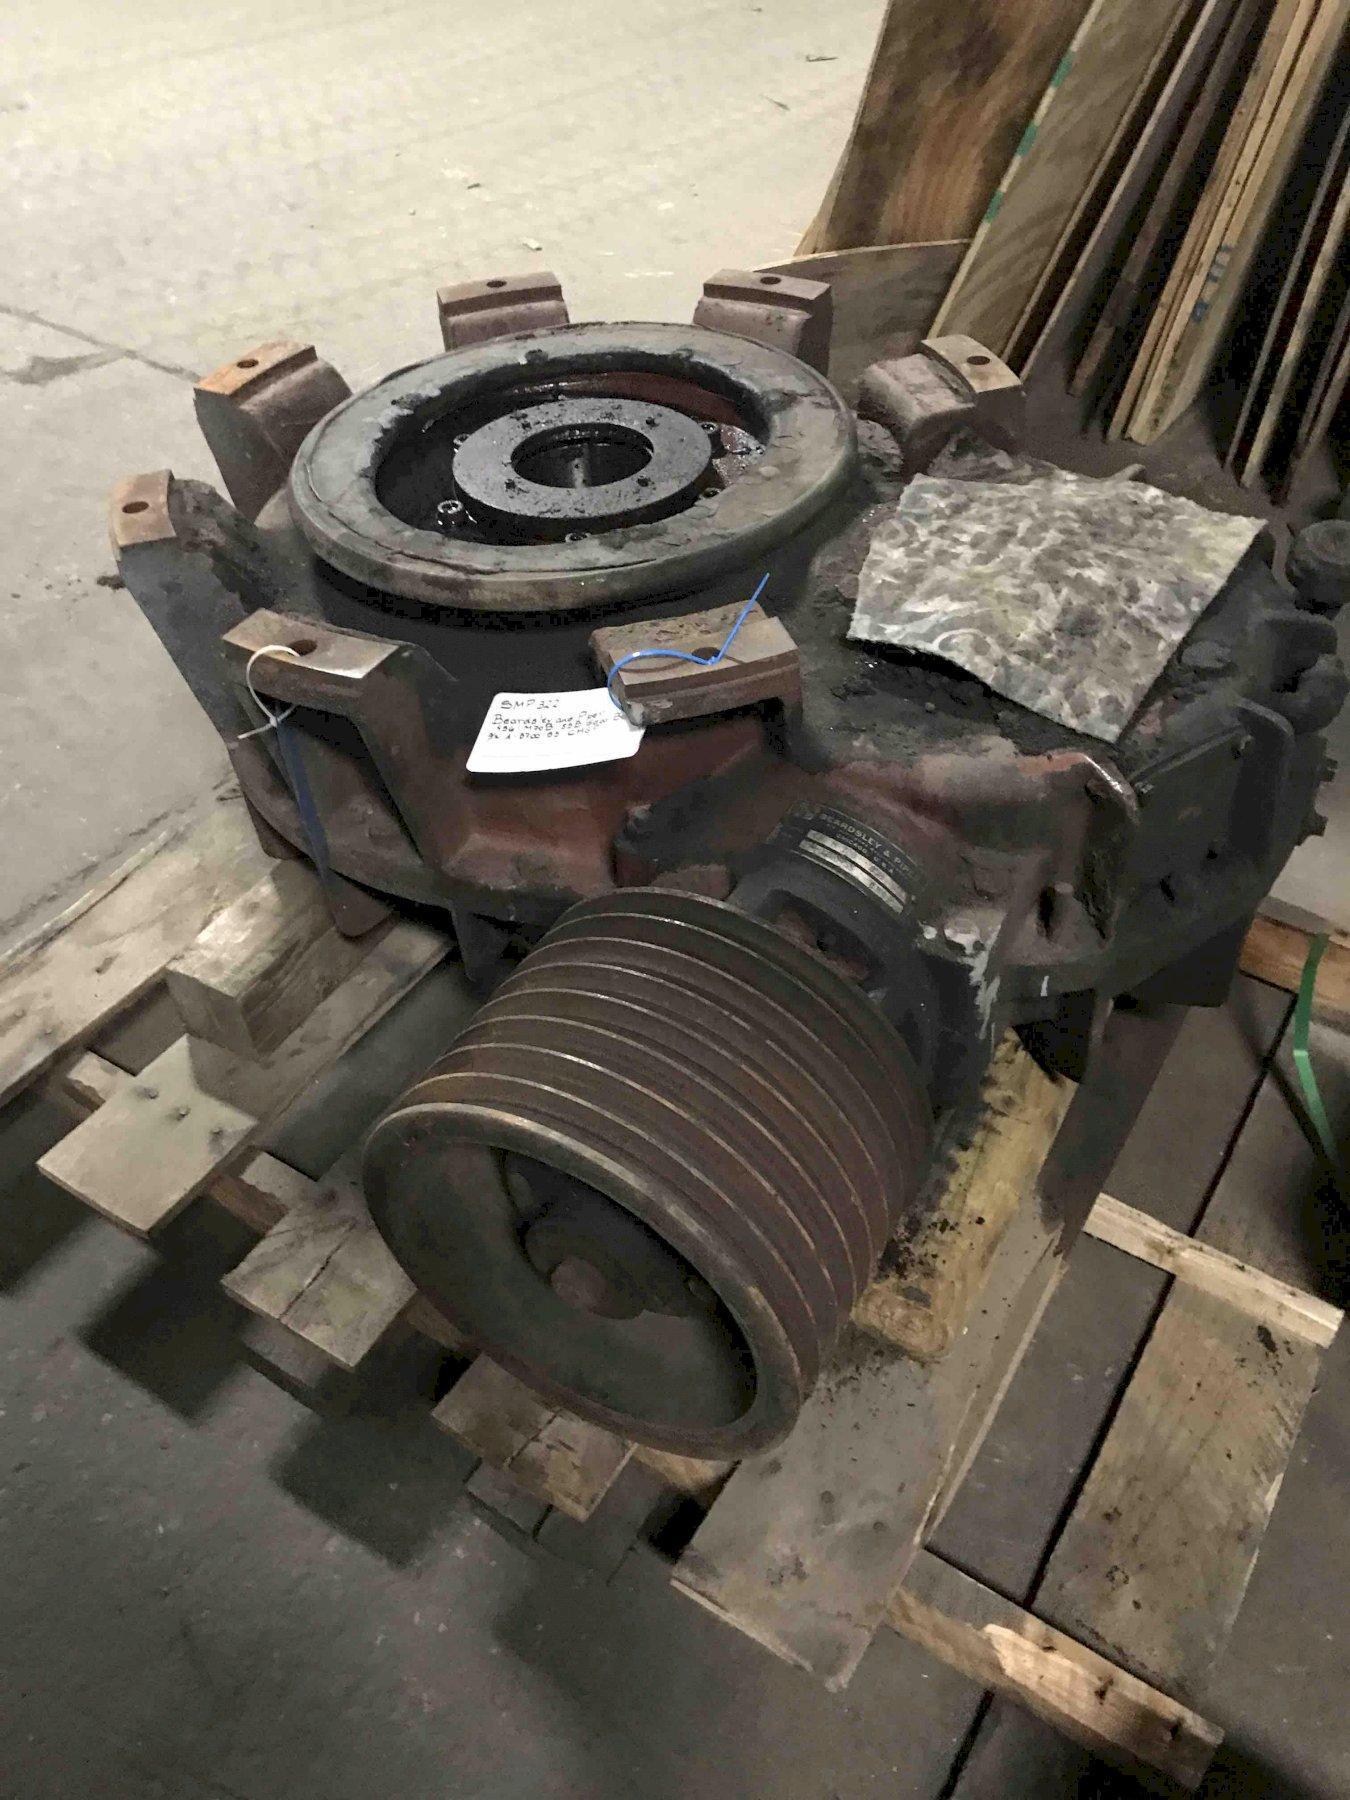 Beardsley & Piper 436-M70B. 85B Gear Box, S/N A-3700-55 CHGP.